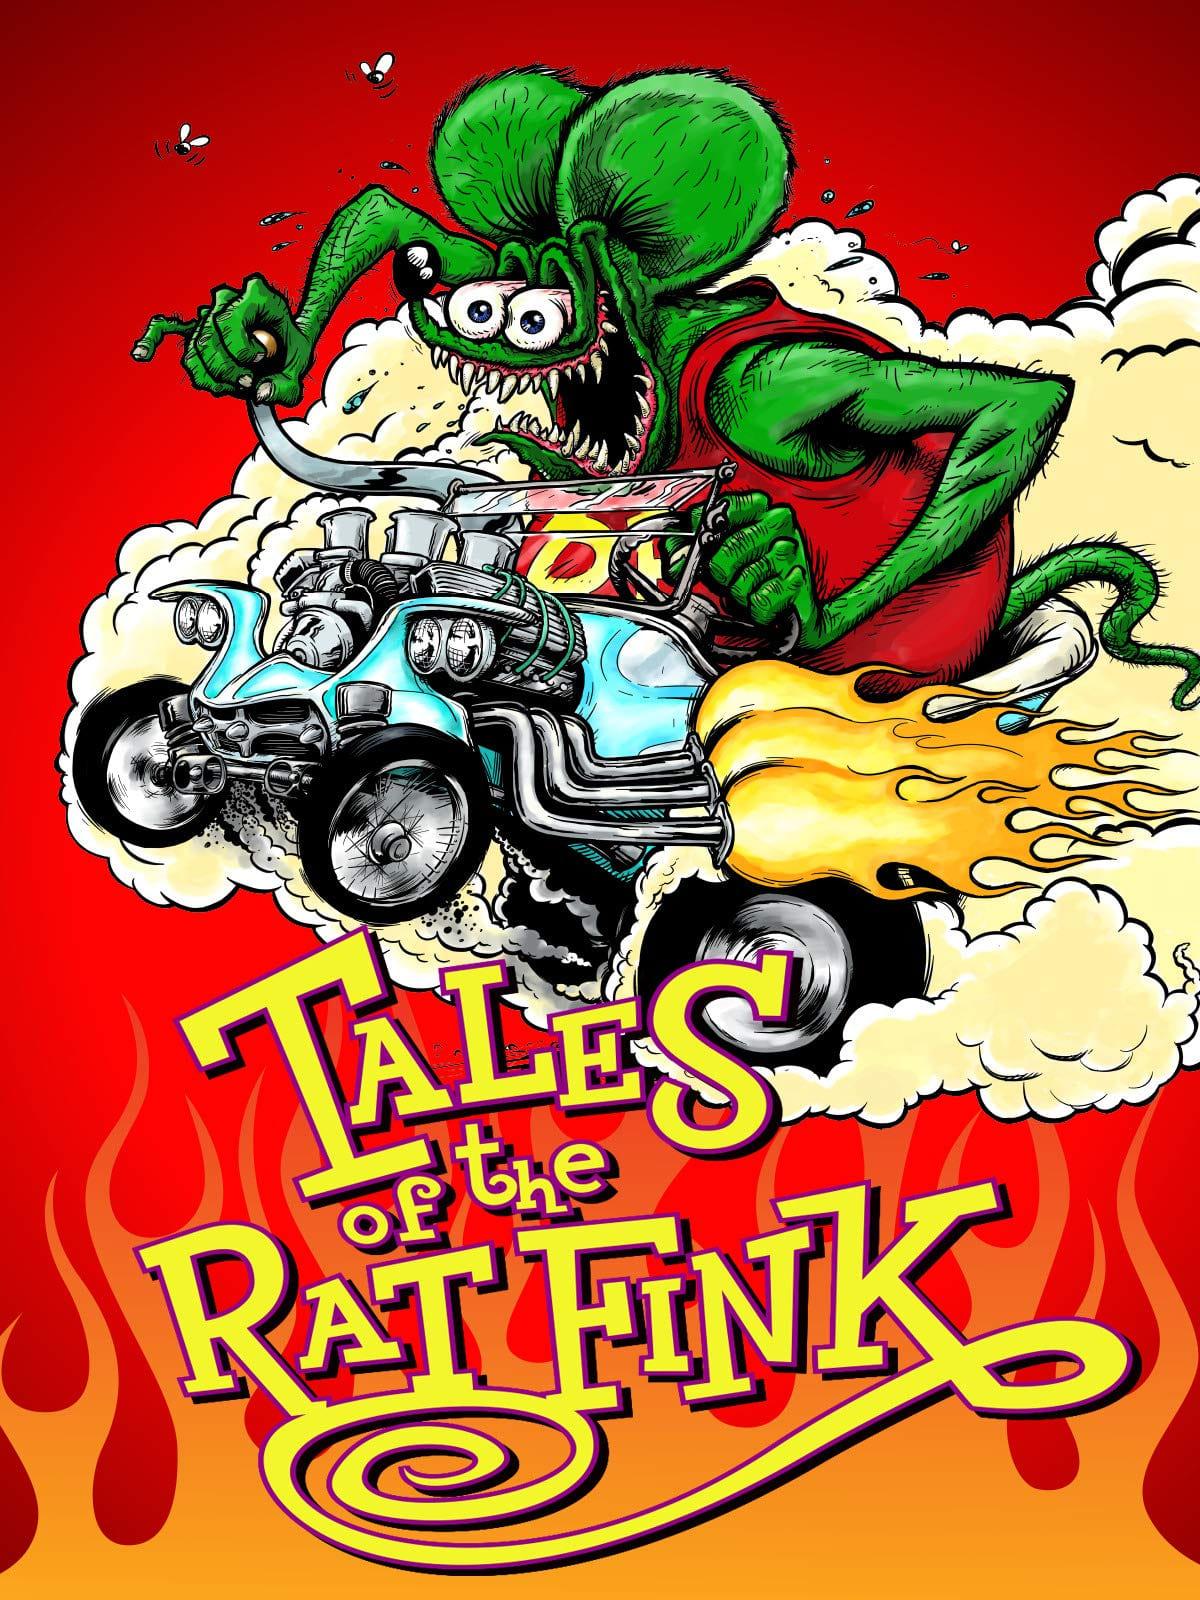 Tales of the Rat Fink (2006)